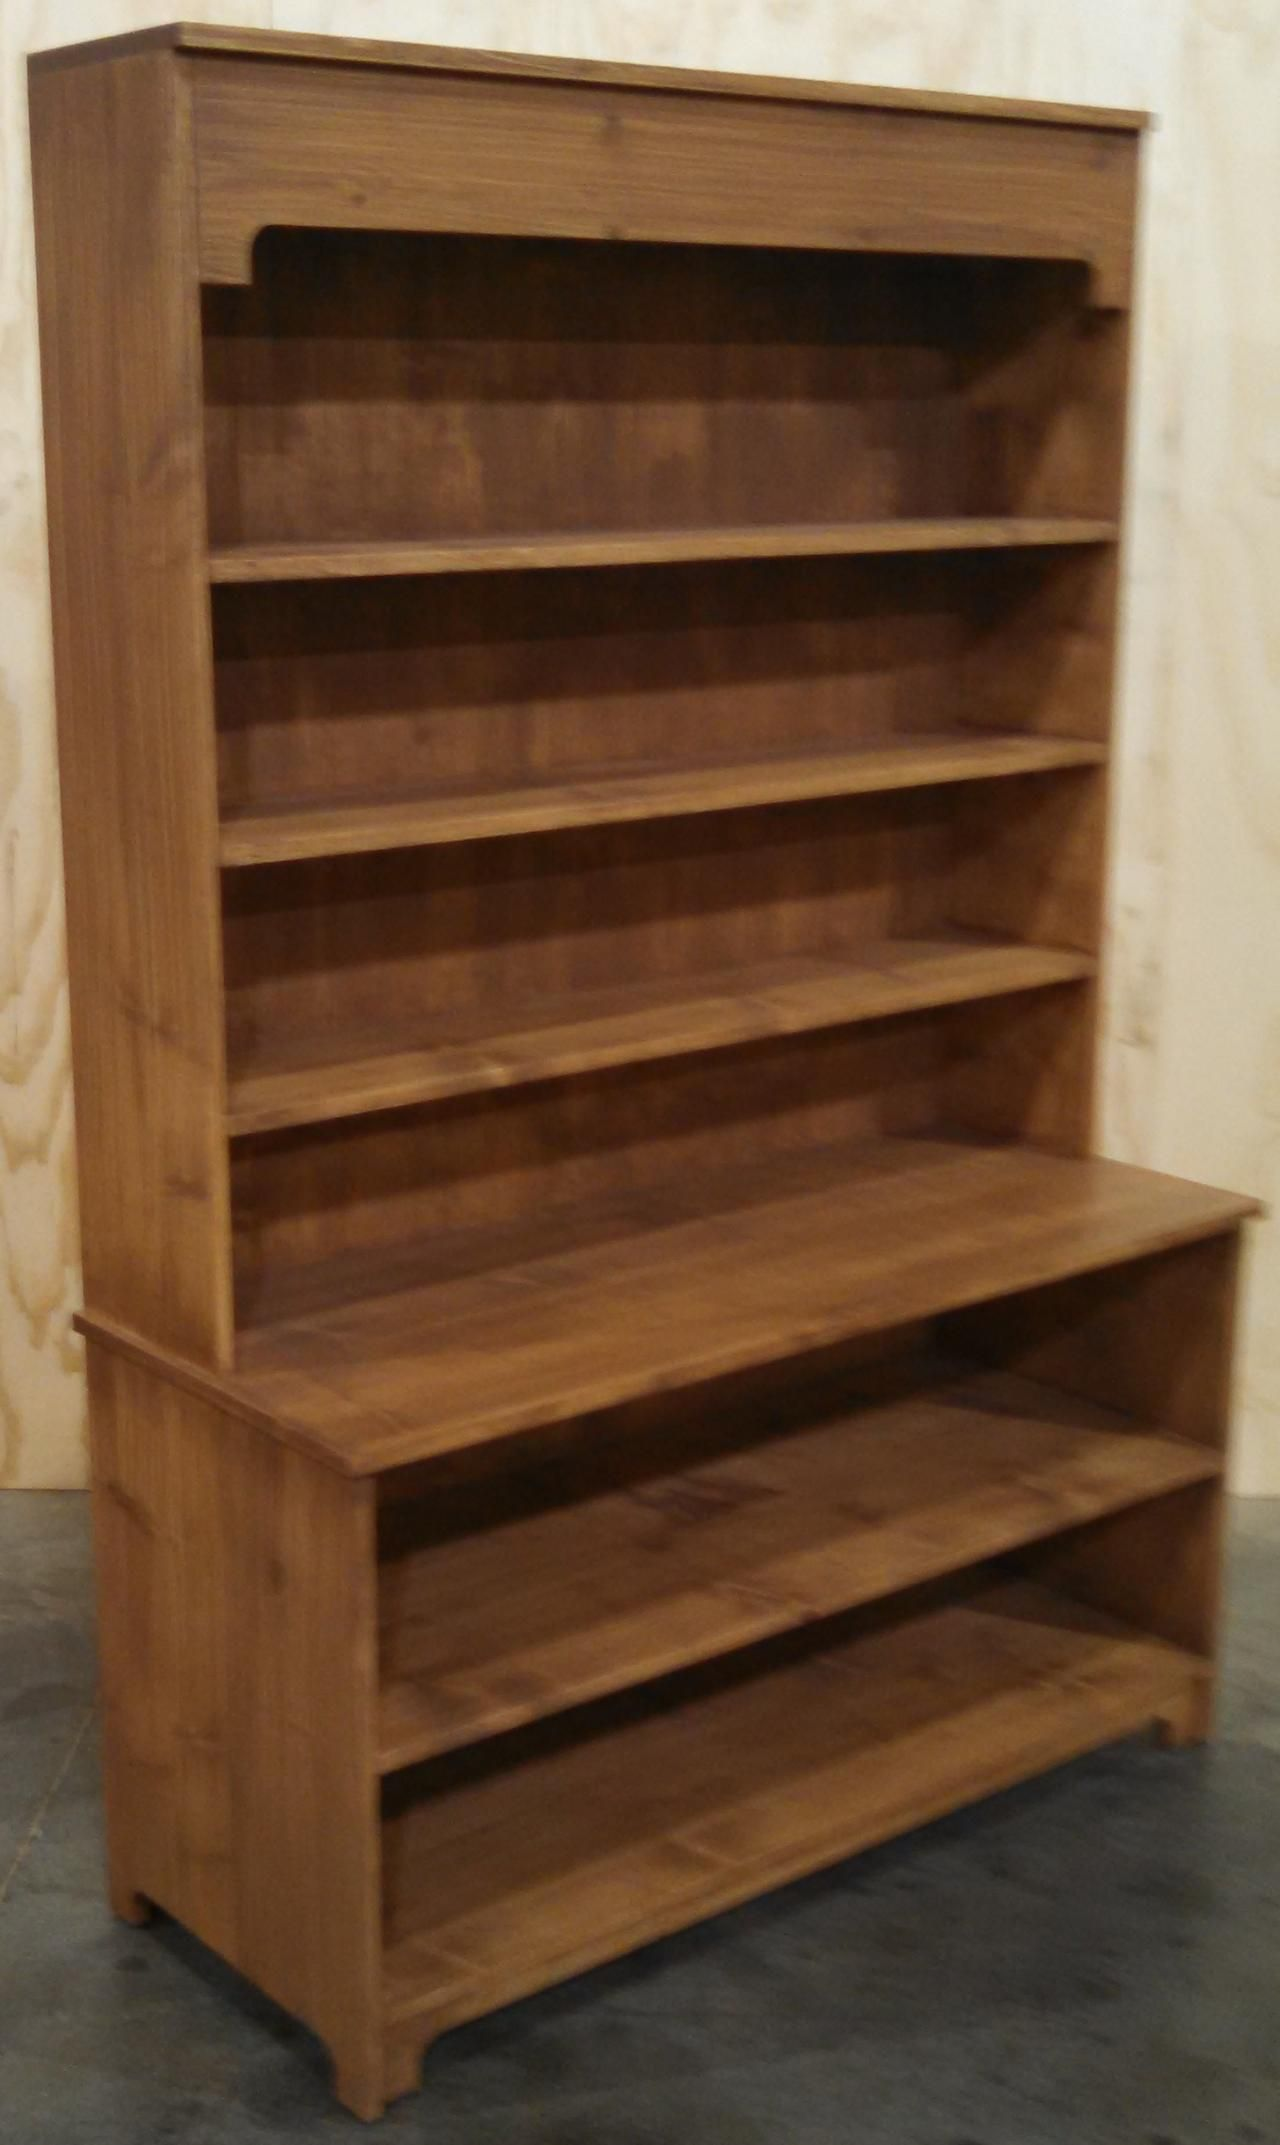 httpwwwjbrothersandcompanycomyahoositeadminassetsimagesrustic wood display cabinet hutch shelves primitive0184746largejpg httpwwwjbrothersandcompanycomyahoositeadminassetsimages